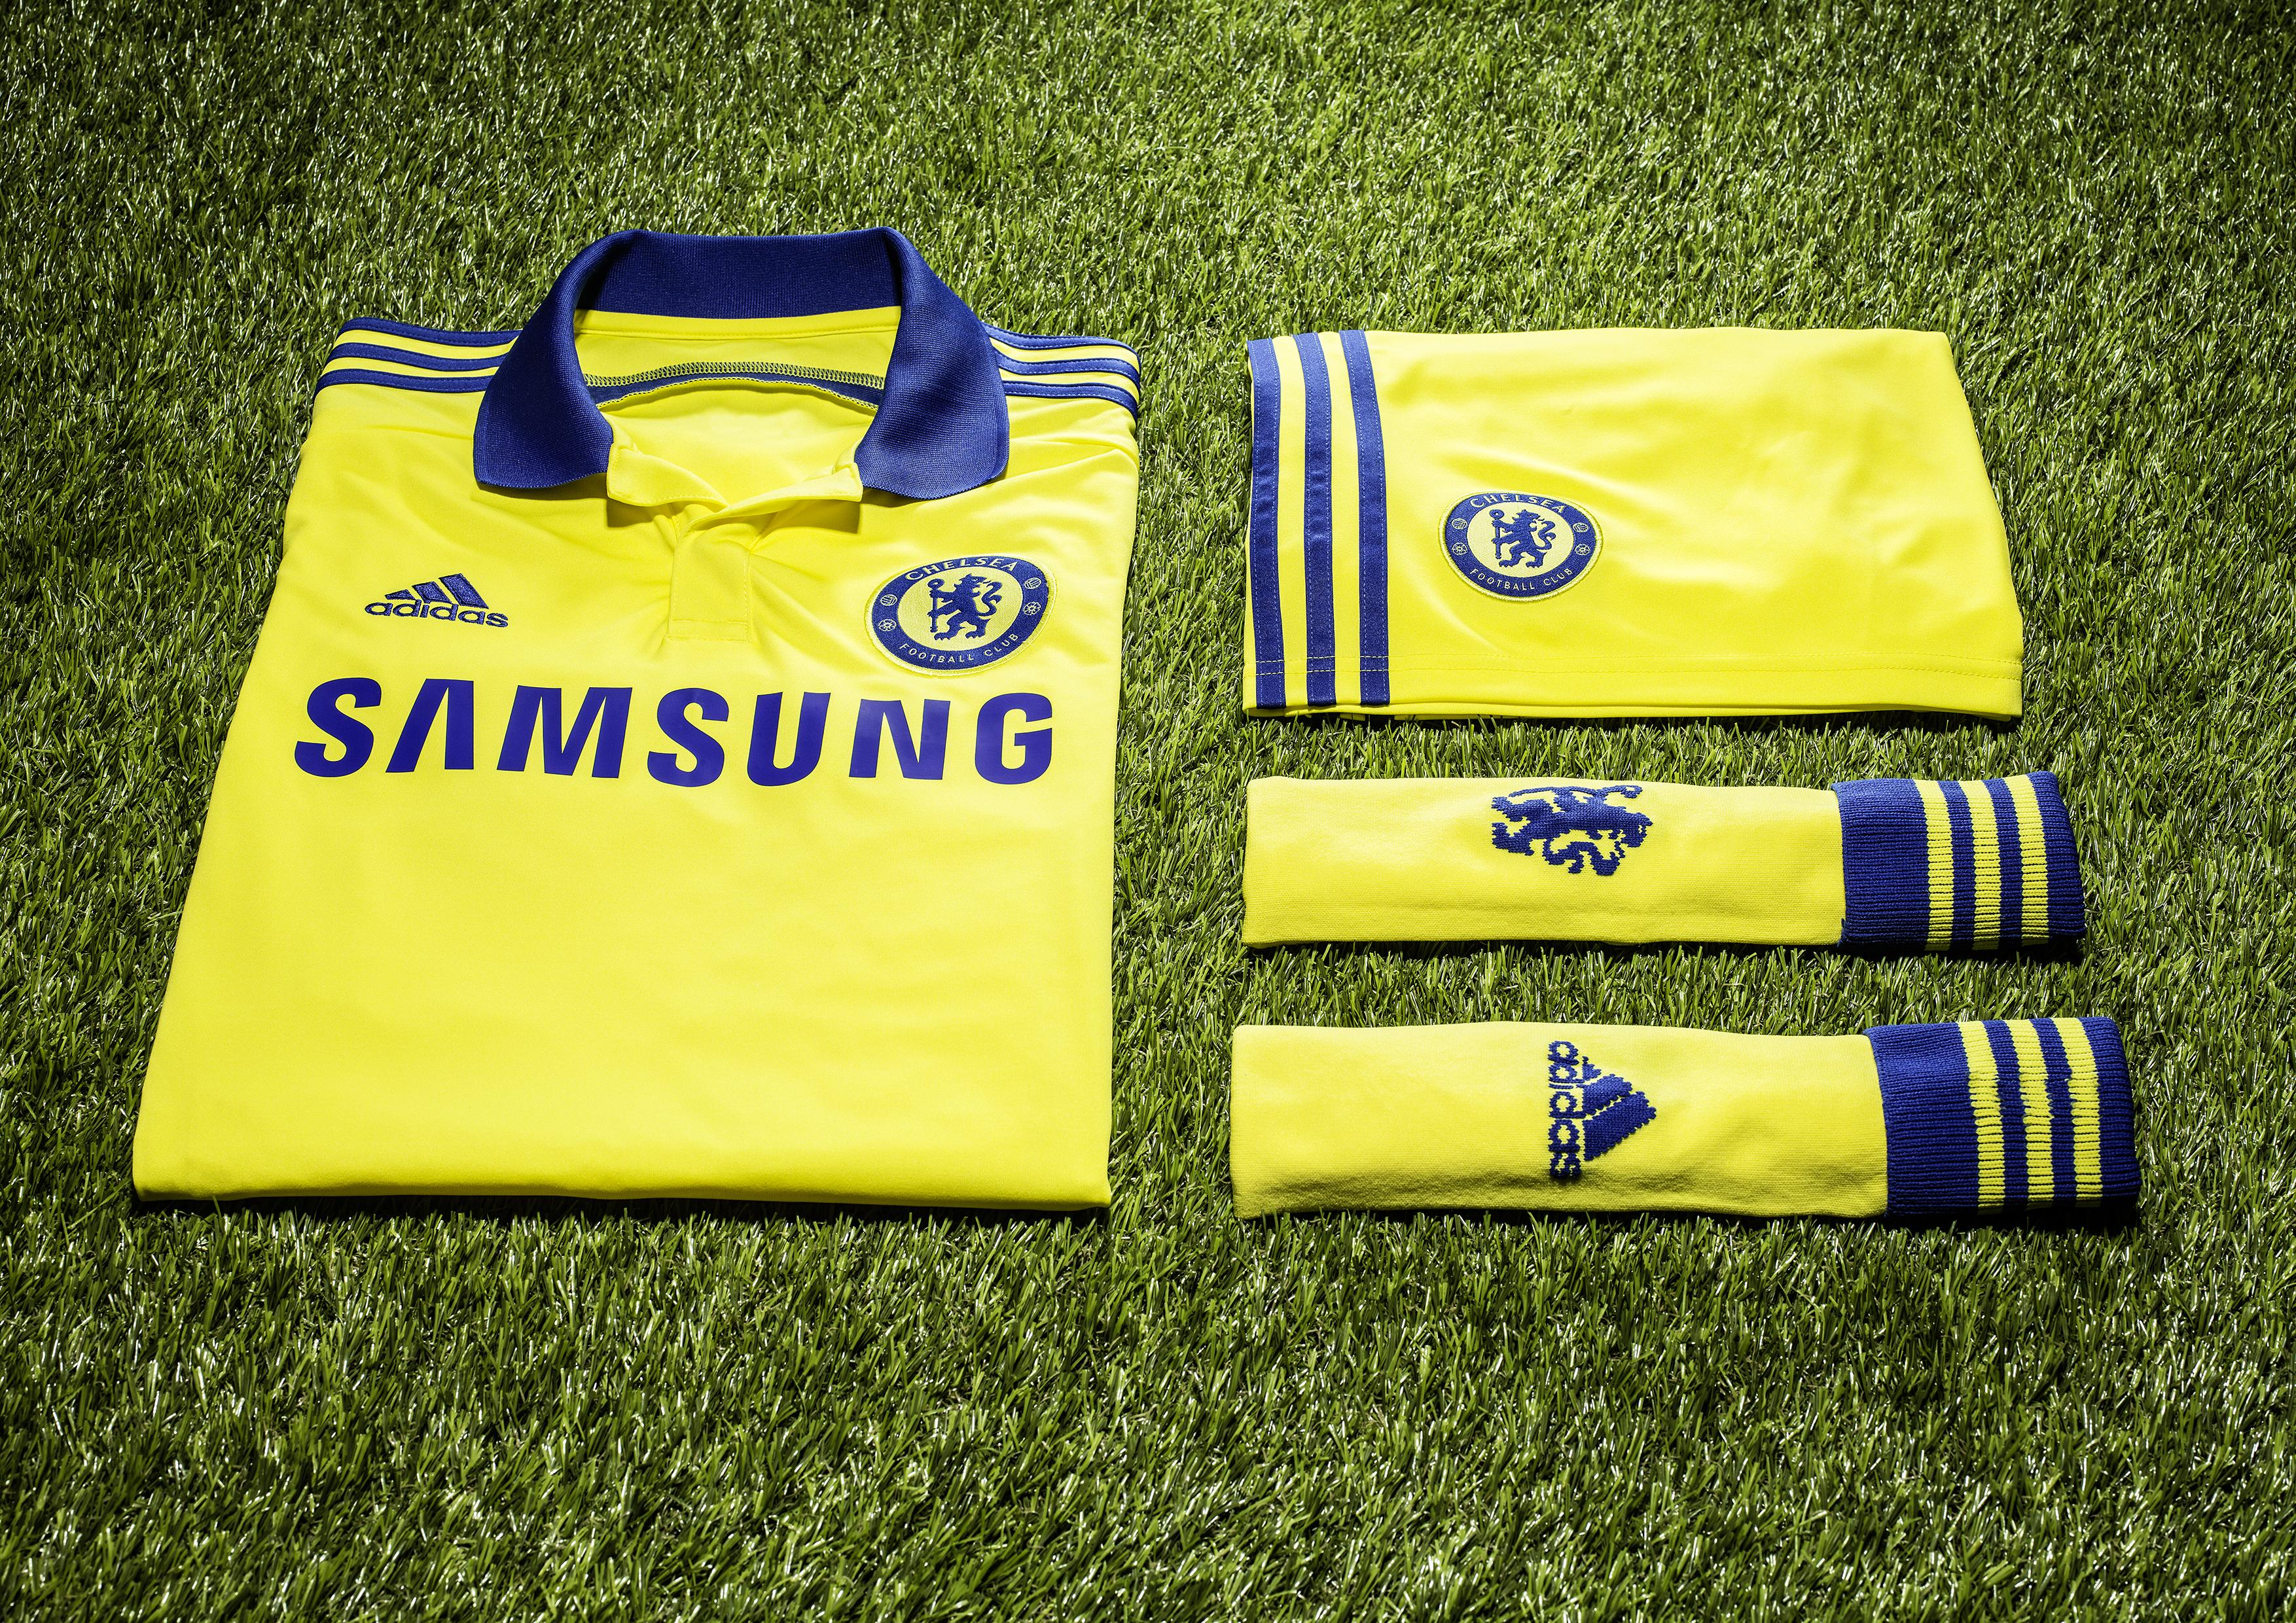 Chelsea FC away on turf · ADI032 CFC 14-15 Kit Launch 1x1 OSCAR AWAY 140408 b787edf2a